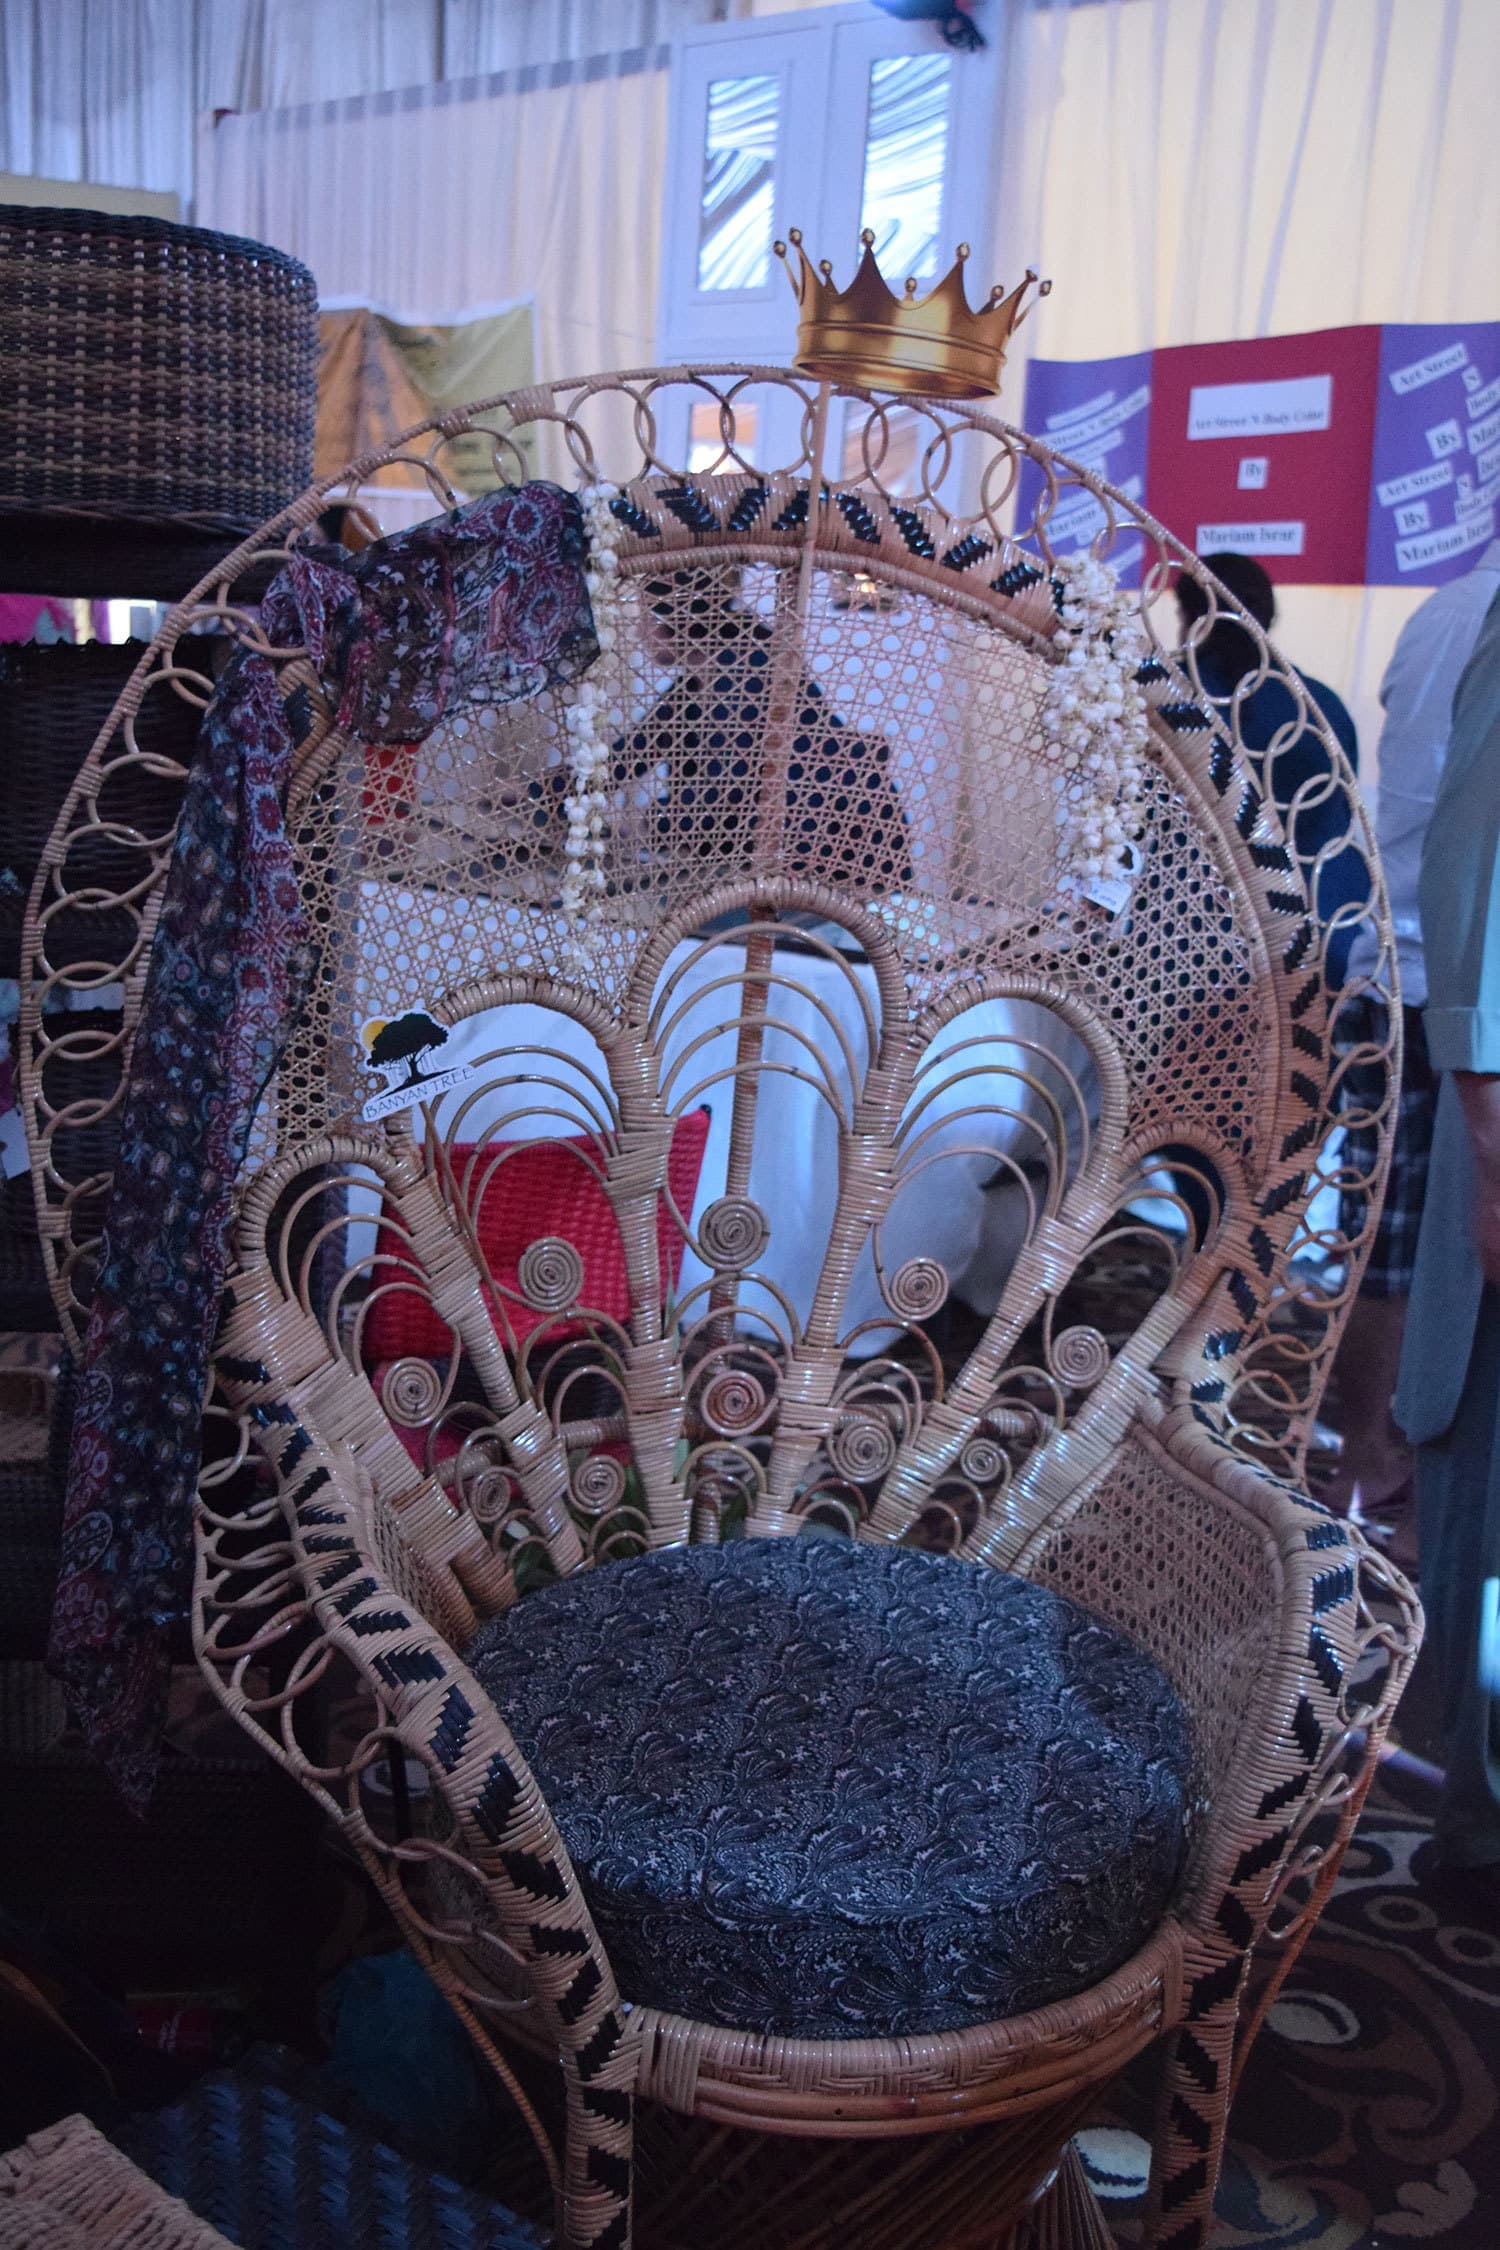 The Peacock chair. — Photo by Zoya Anwer